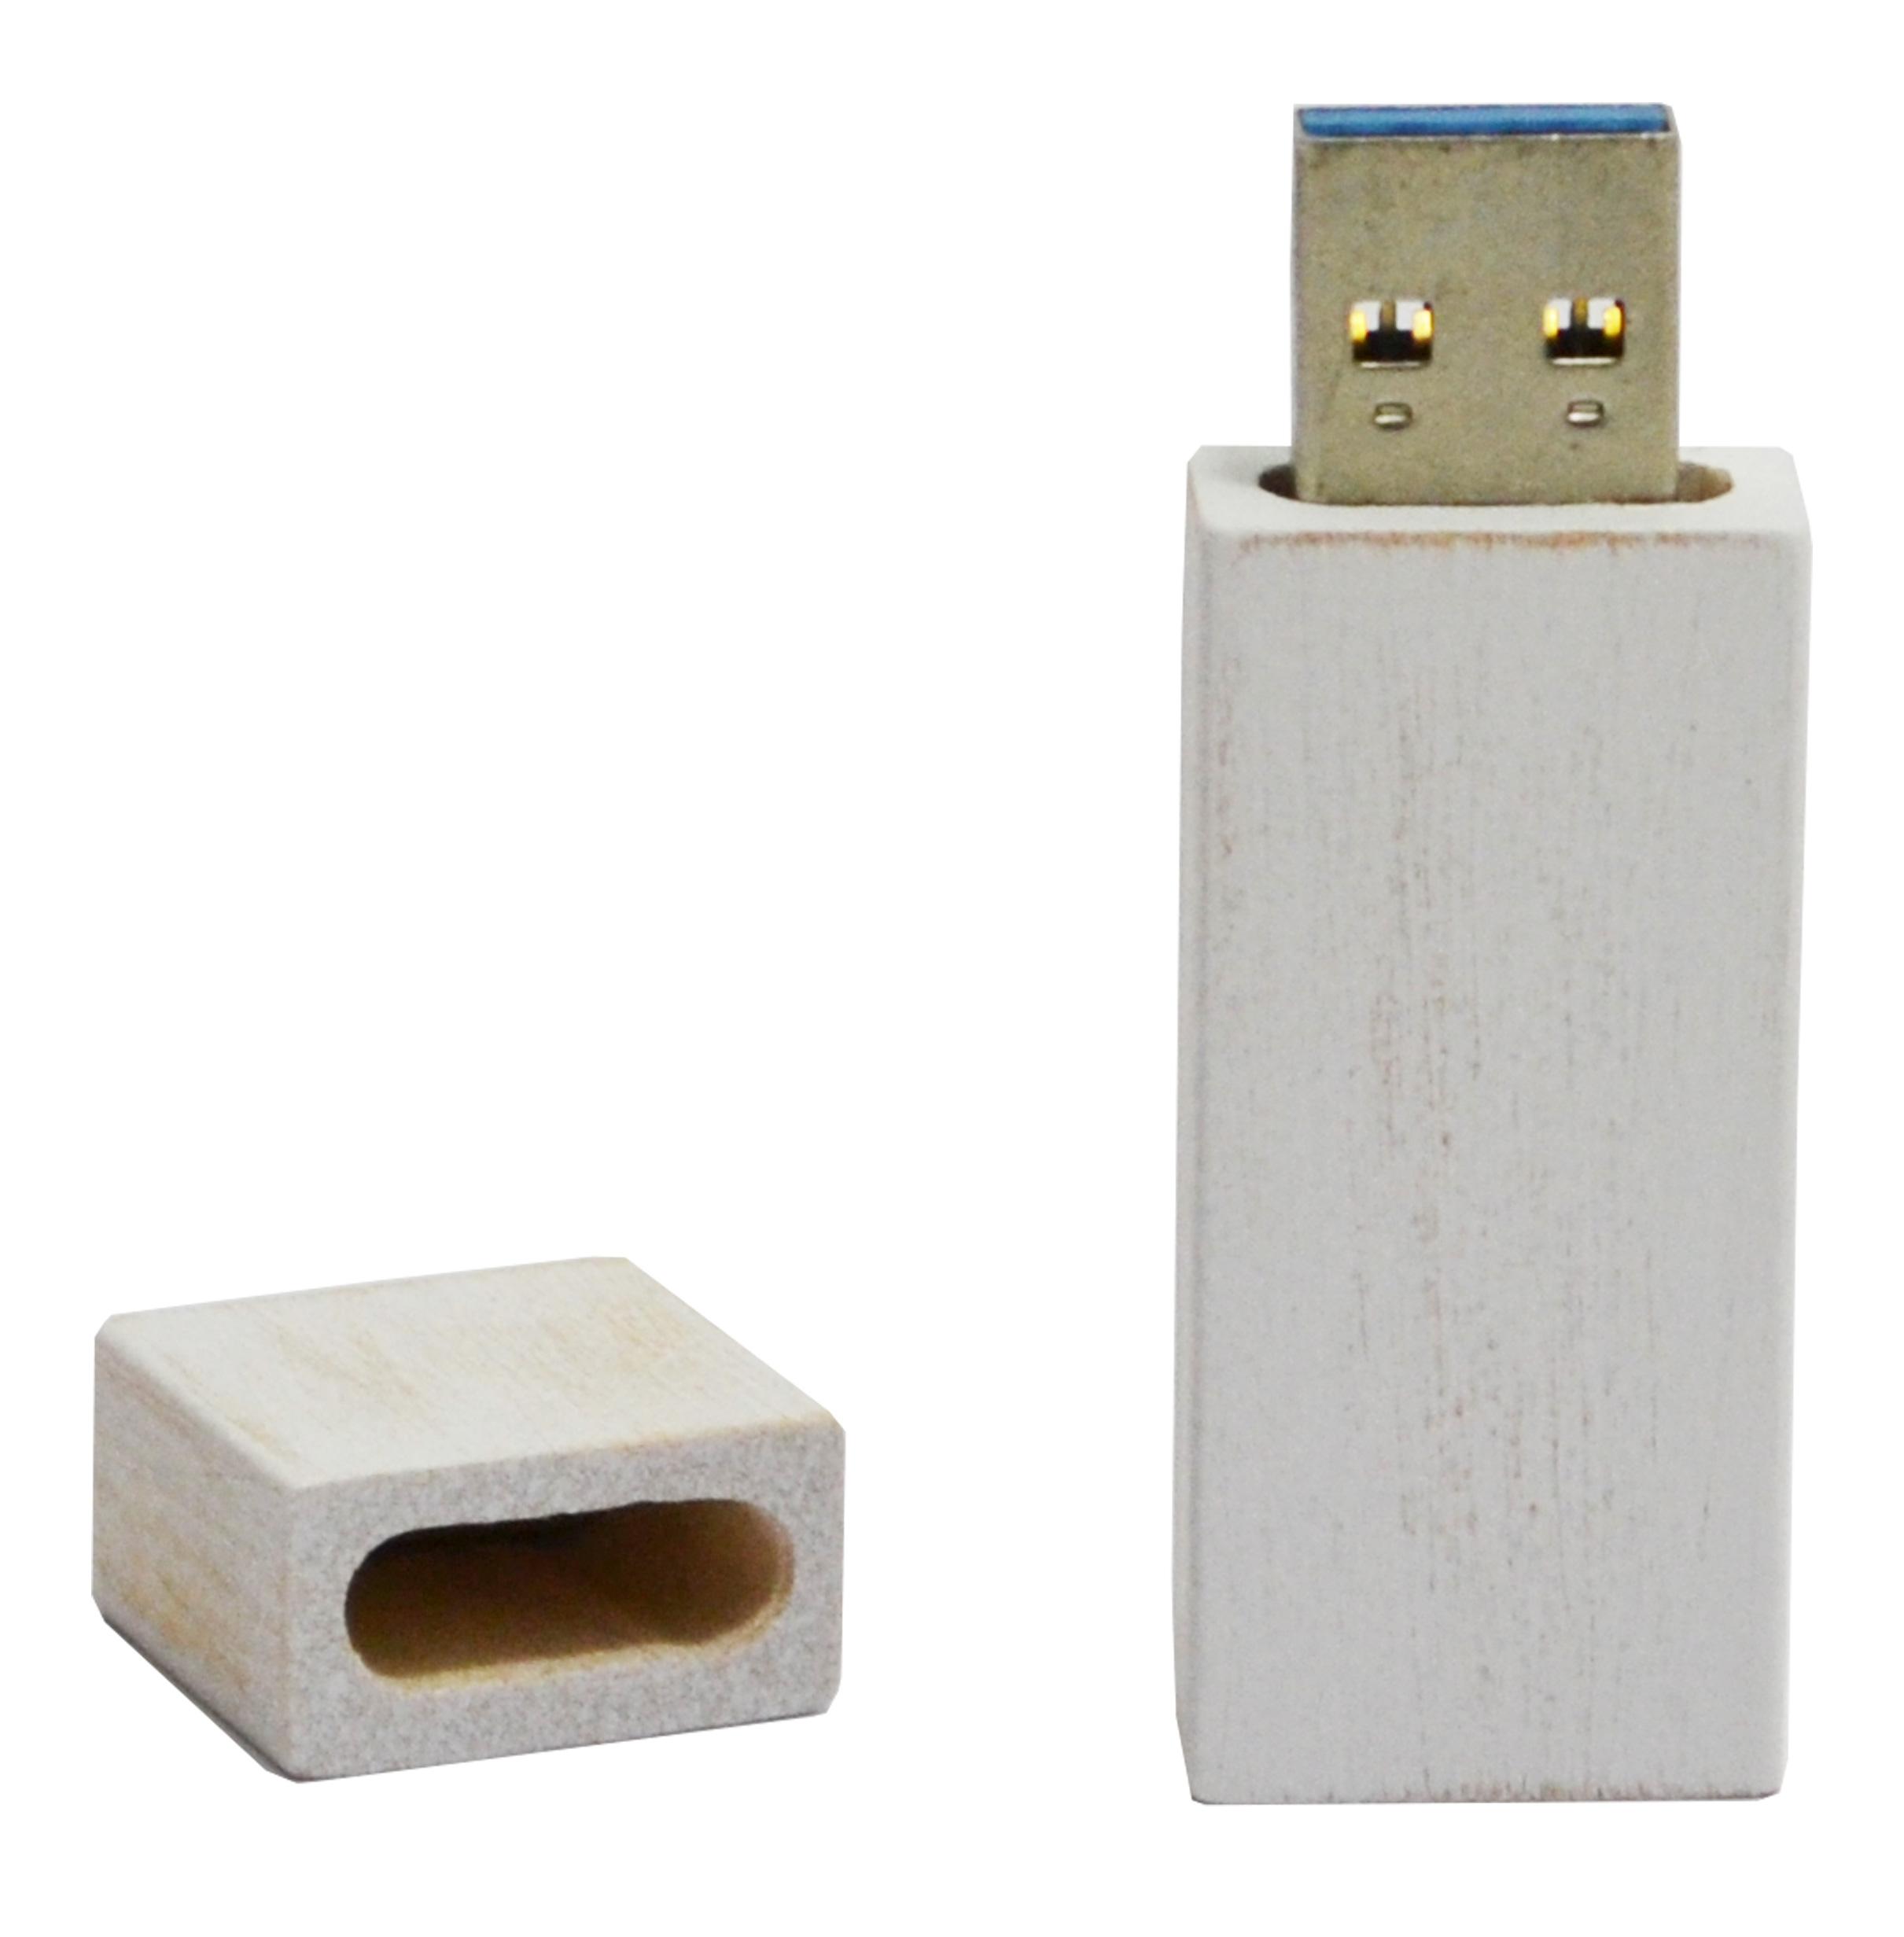 Houten USB geheugenstick